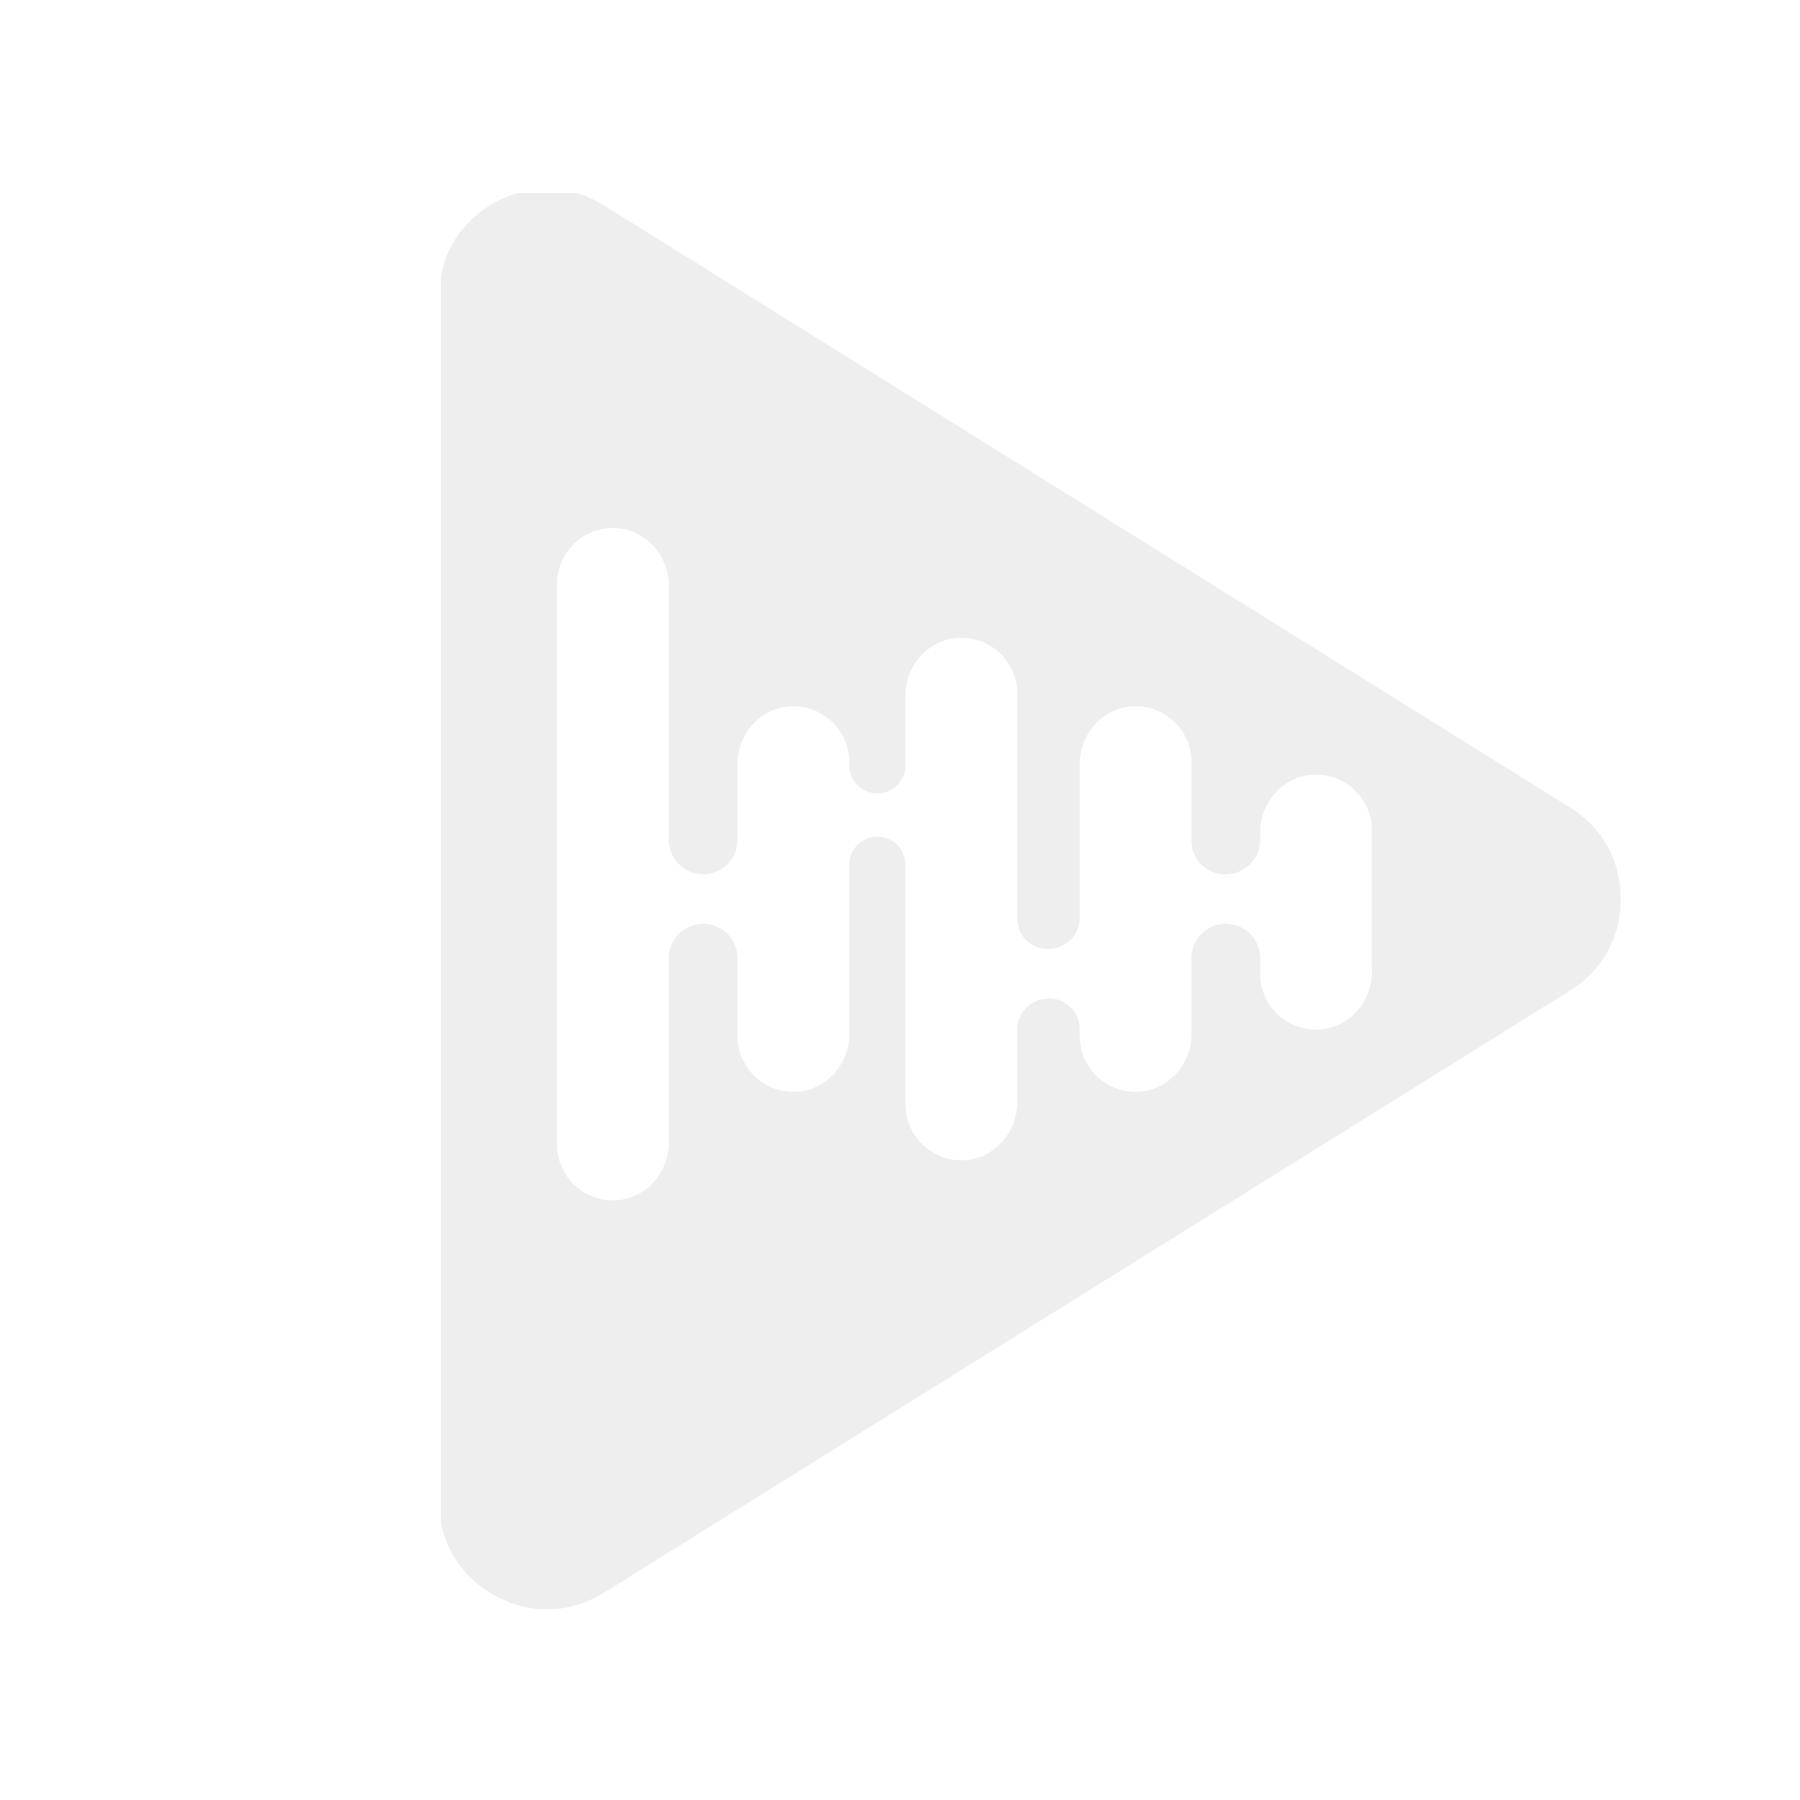 Connect GR00010 - Universal høyttalergrill, 100mm/4